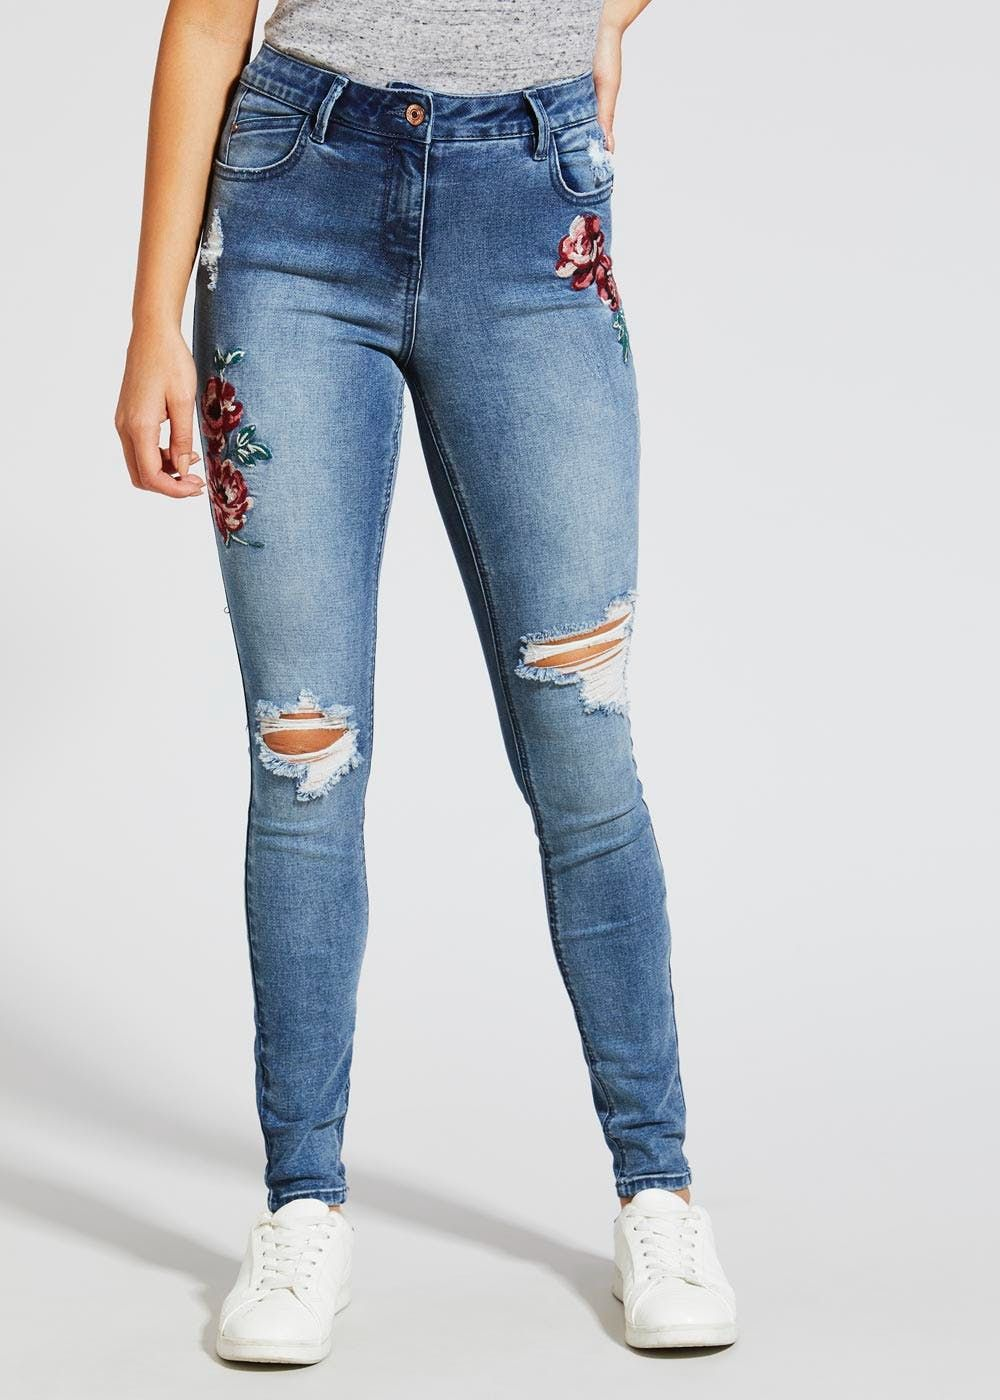 640b960e2d2 April Embroidered Super Skinny Jeans | Wishlist | Super skinny jeans ...